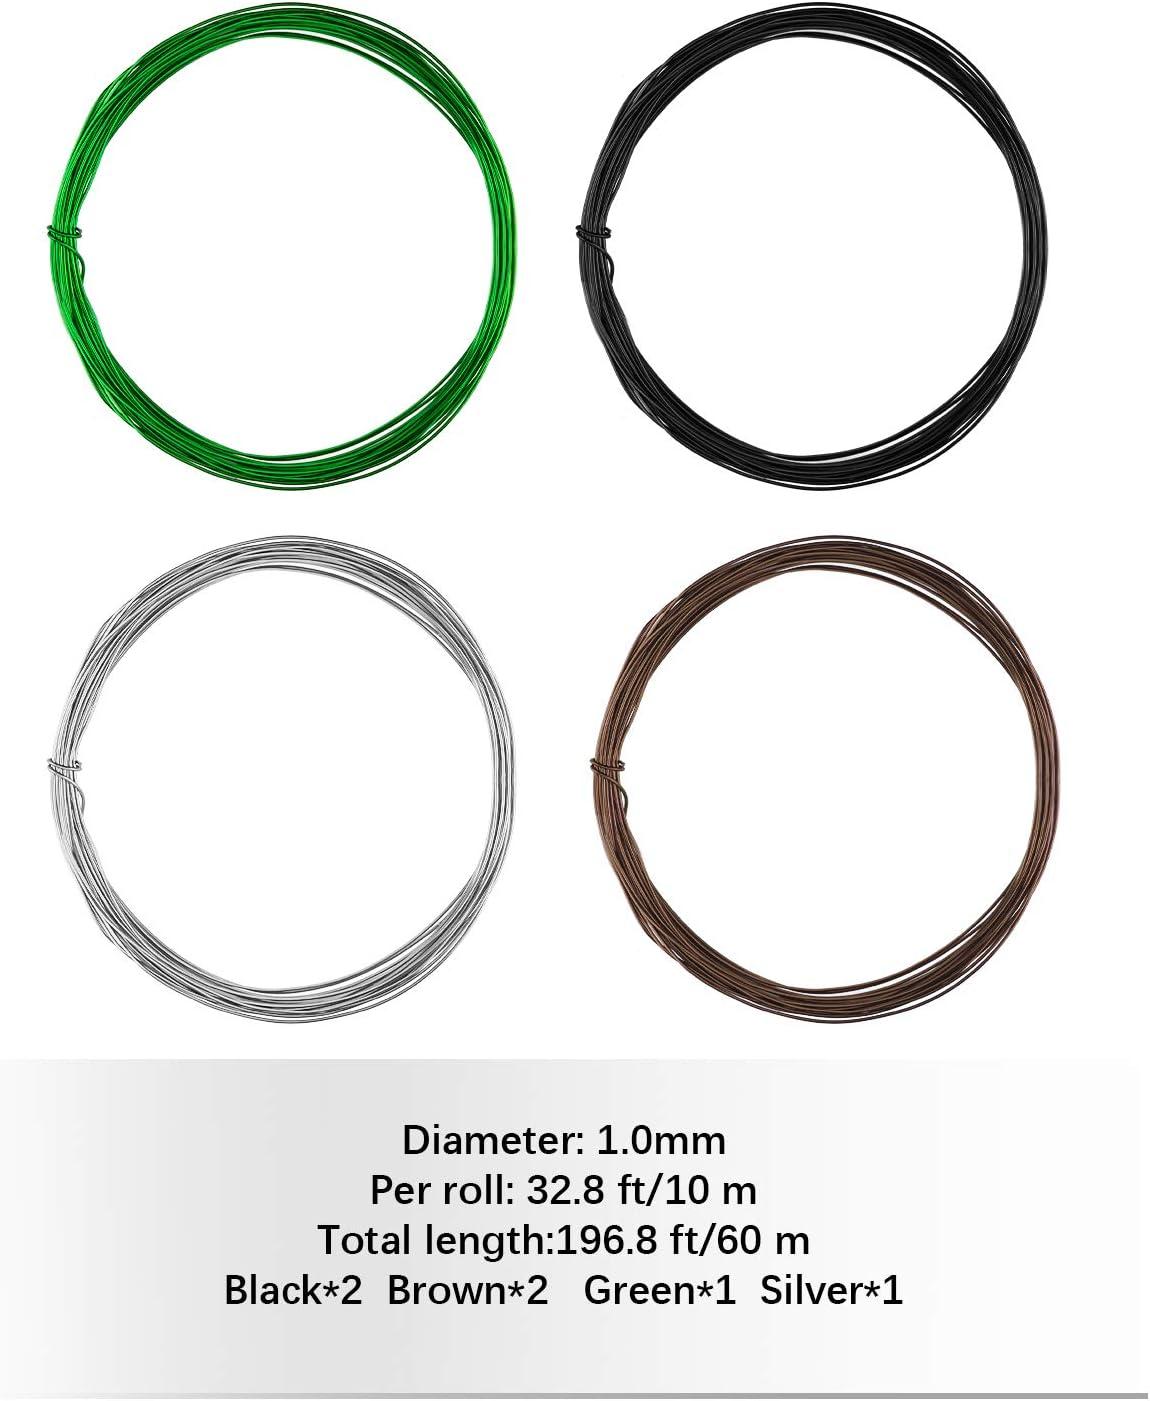 AIEX 1mm 6 Rollen Bonsai-Draht Set insgesamt 196.8 Fu/ß f/ür Bonsai-Baumtraining und Basteln Zangen Schwarz, Braun, Silber, Gr/ün